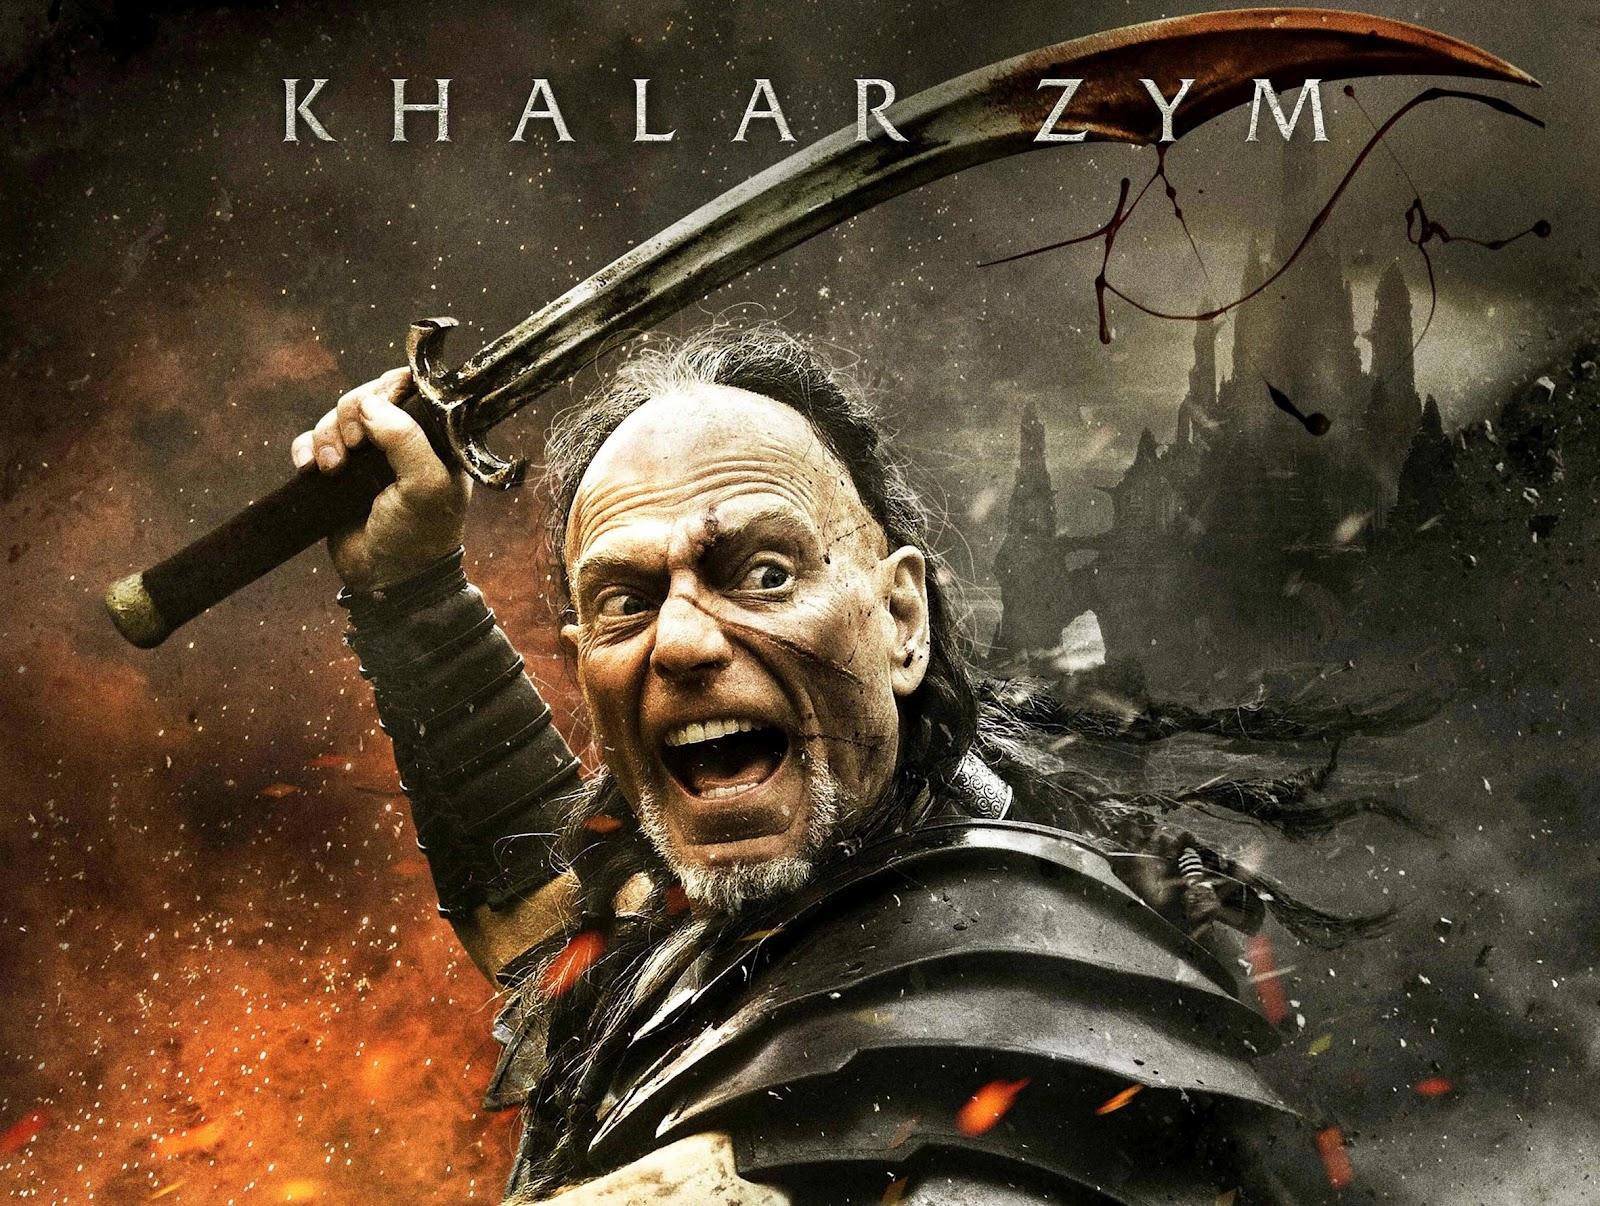 Conan 2011 Minimalist soresport movies: conan the barbarian (2011) - action